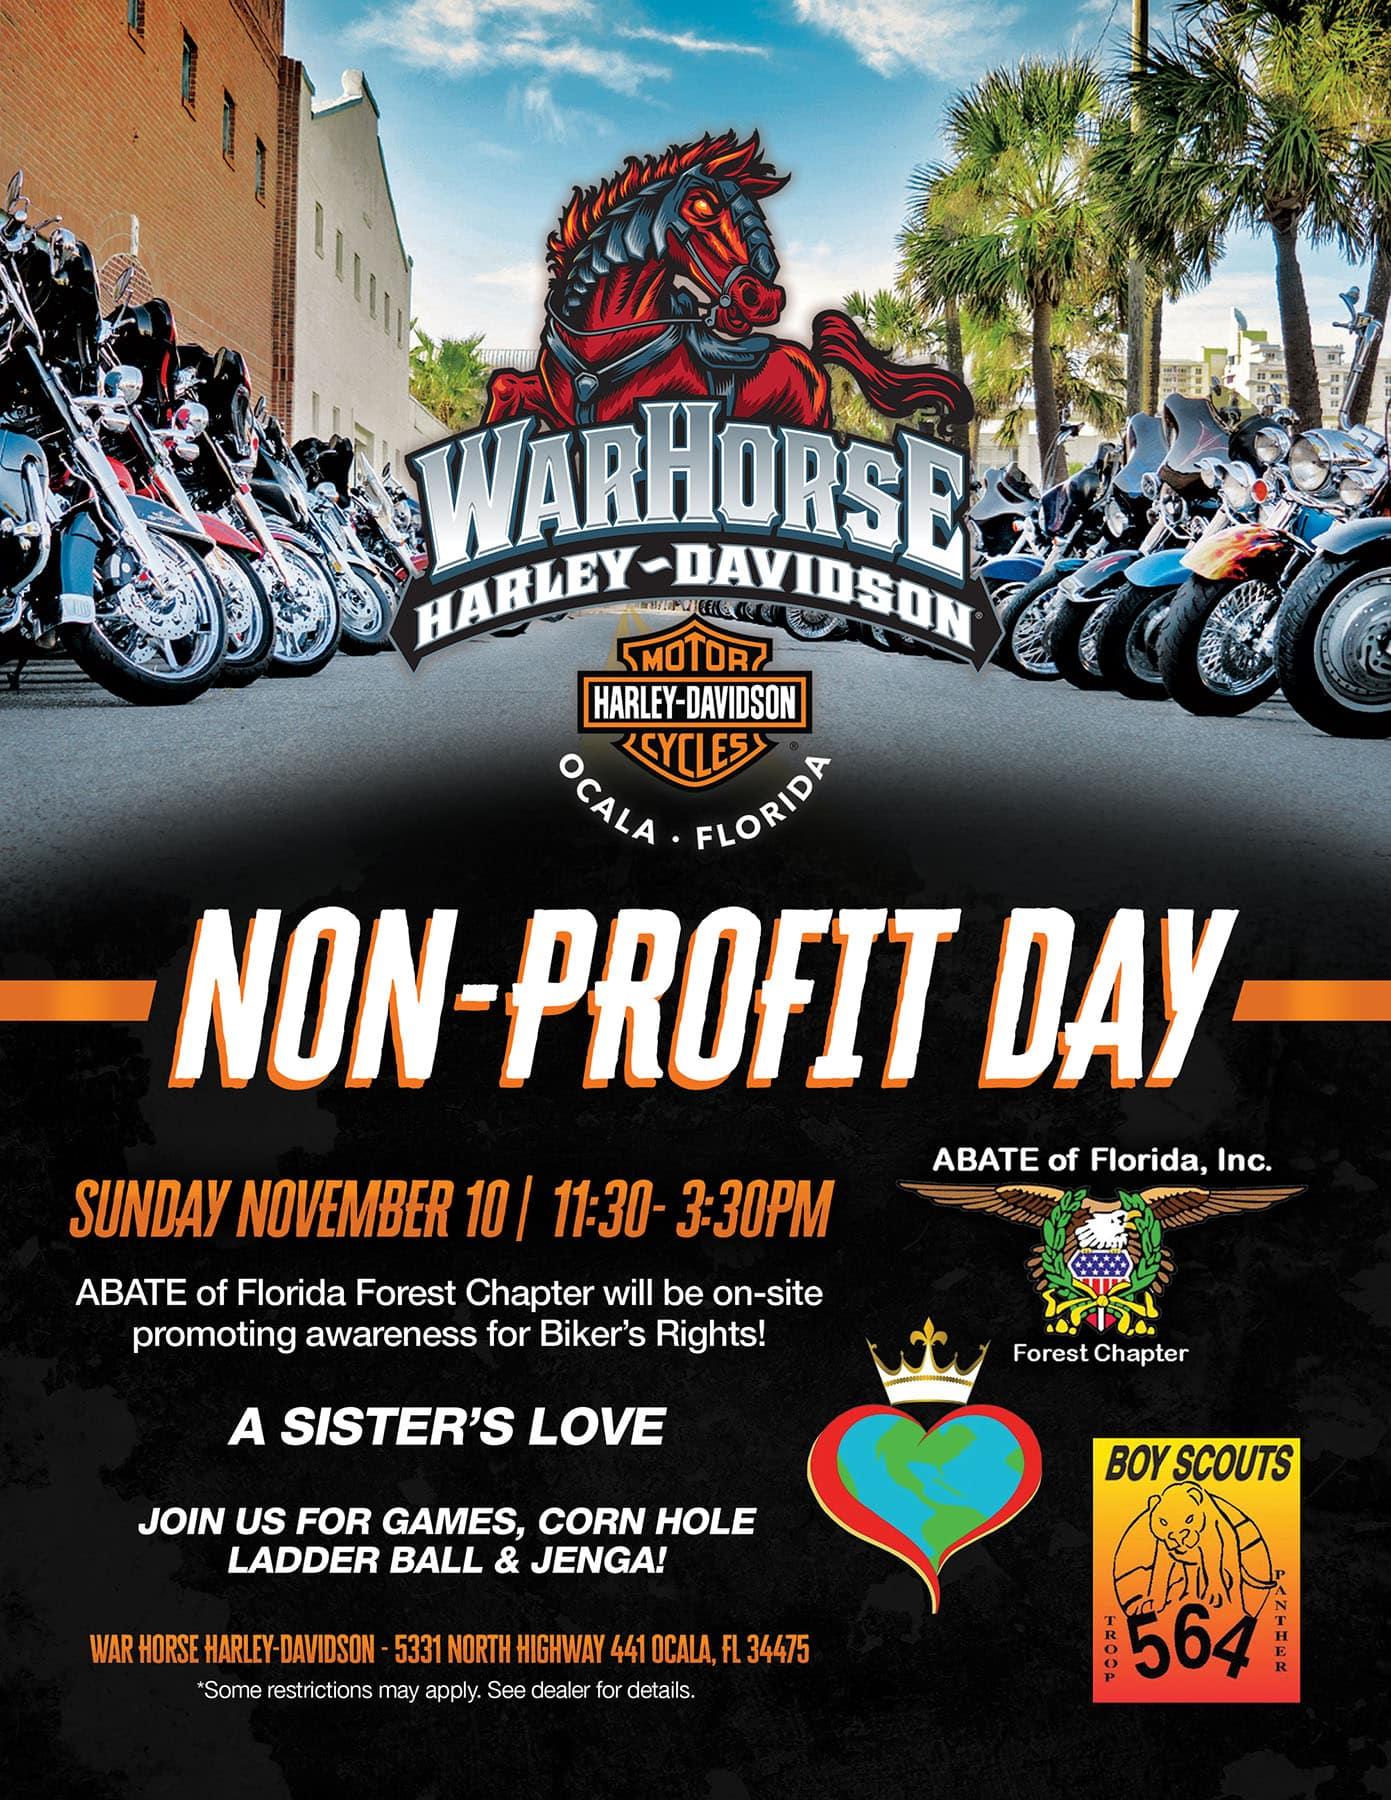 Non-Profit Sunday at WarHorse Harley-Davidson